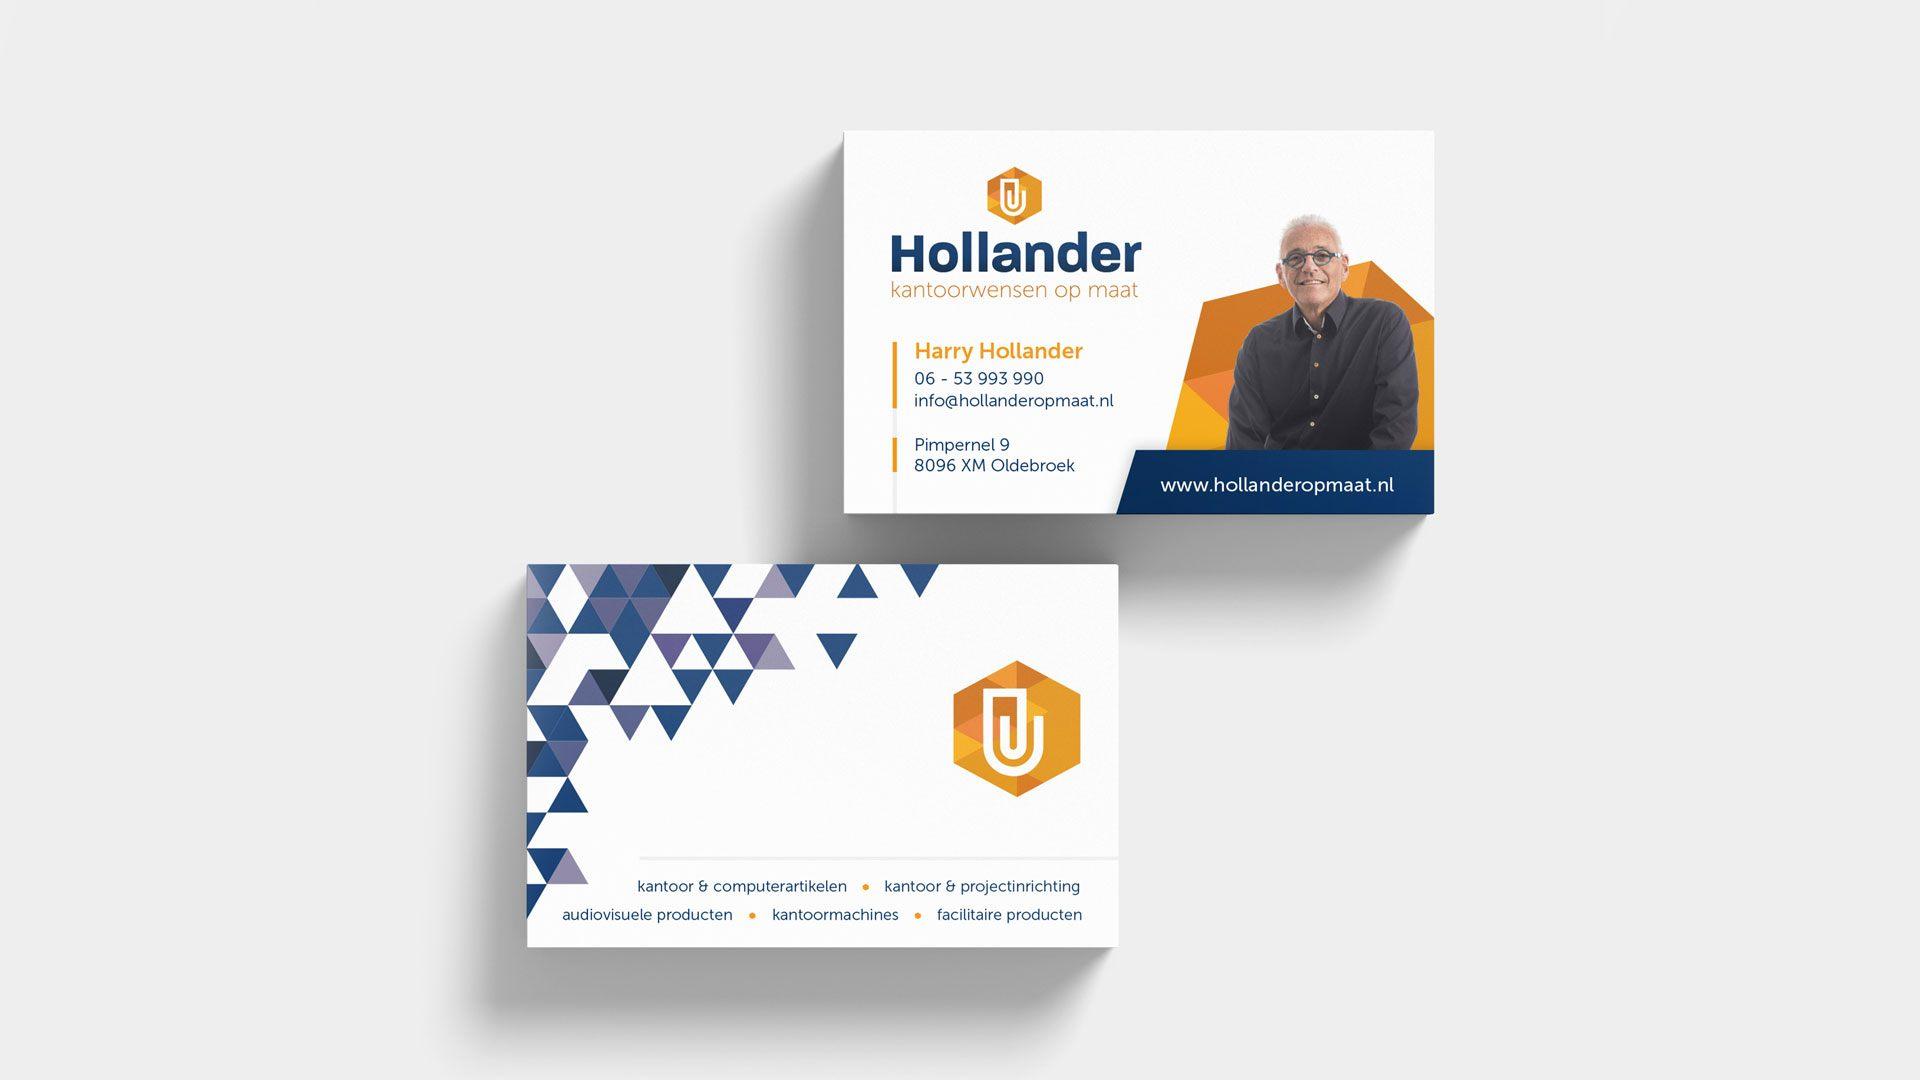 Hollander-Visitekaartje-MU 2